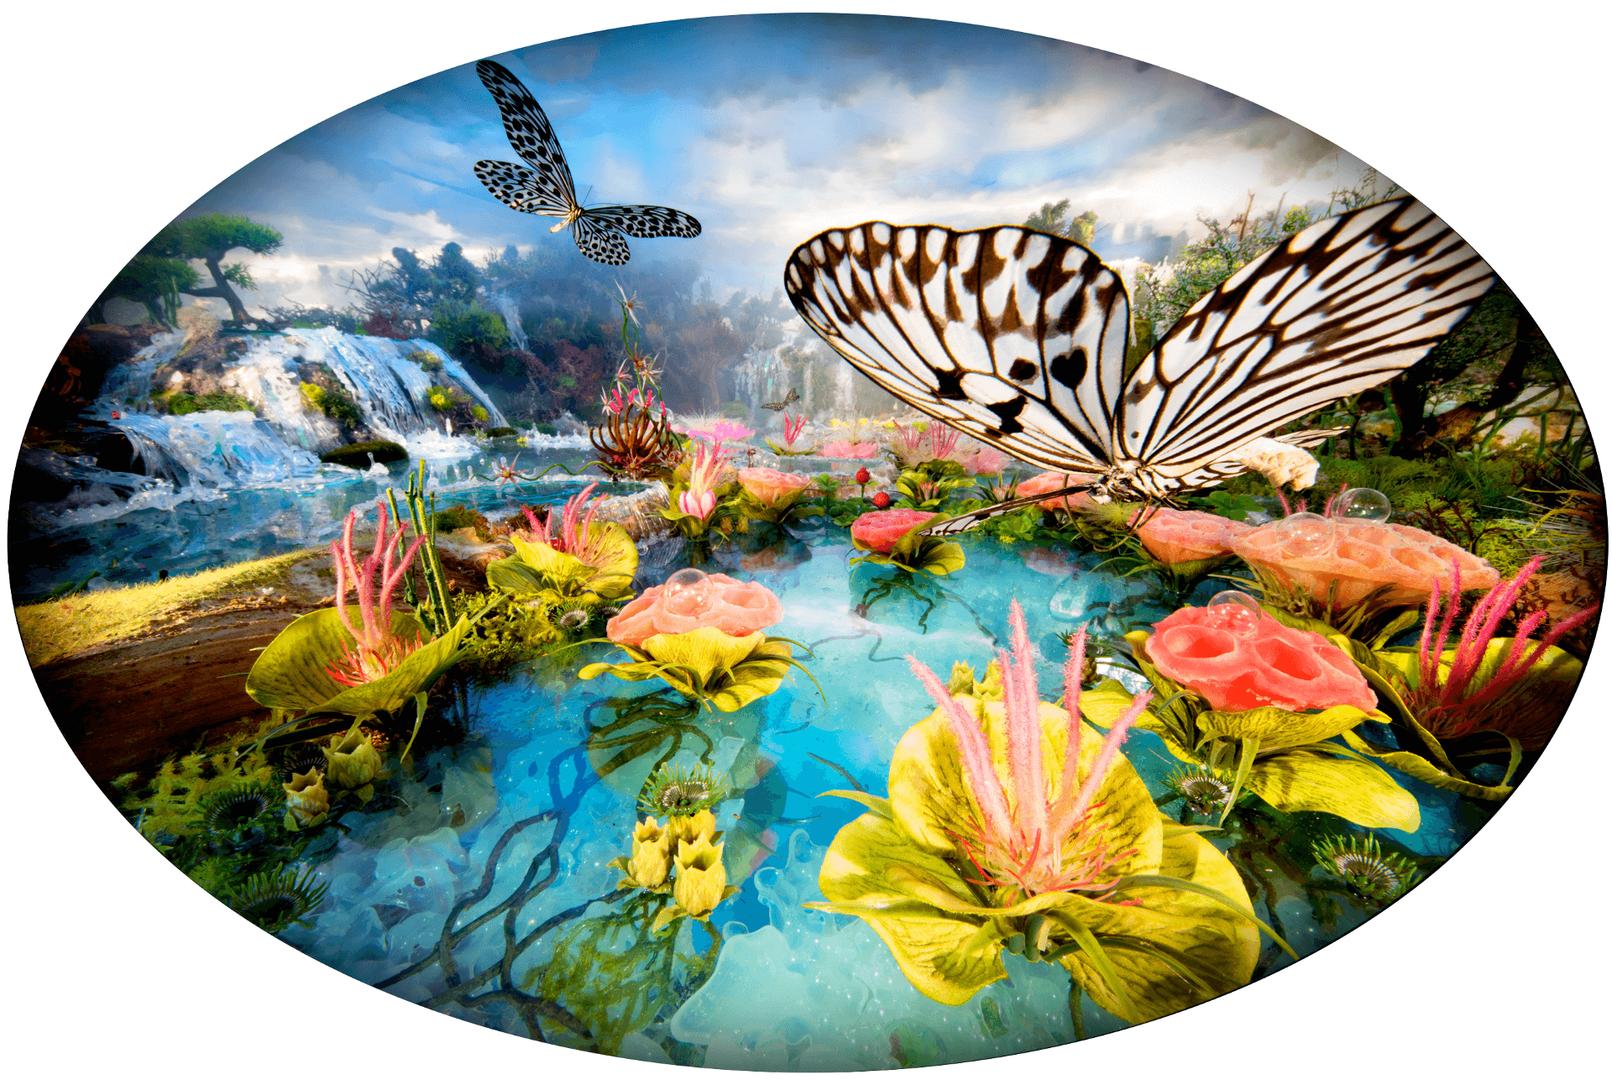 Bethany de Forest - Waterfall butterflies 瀑布蝴蝶